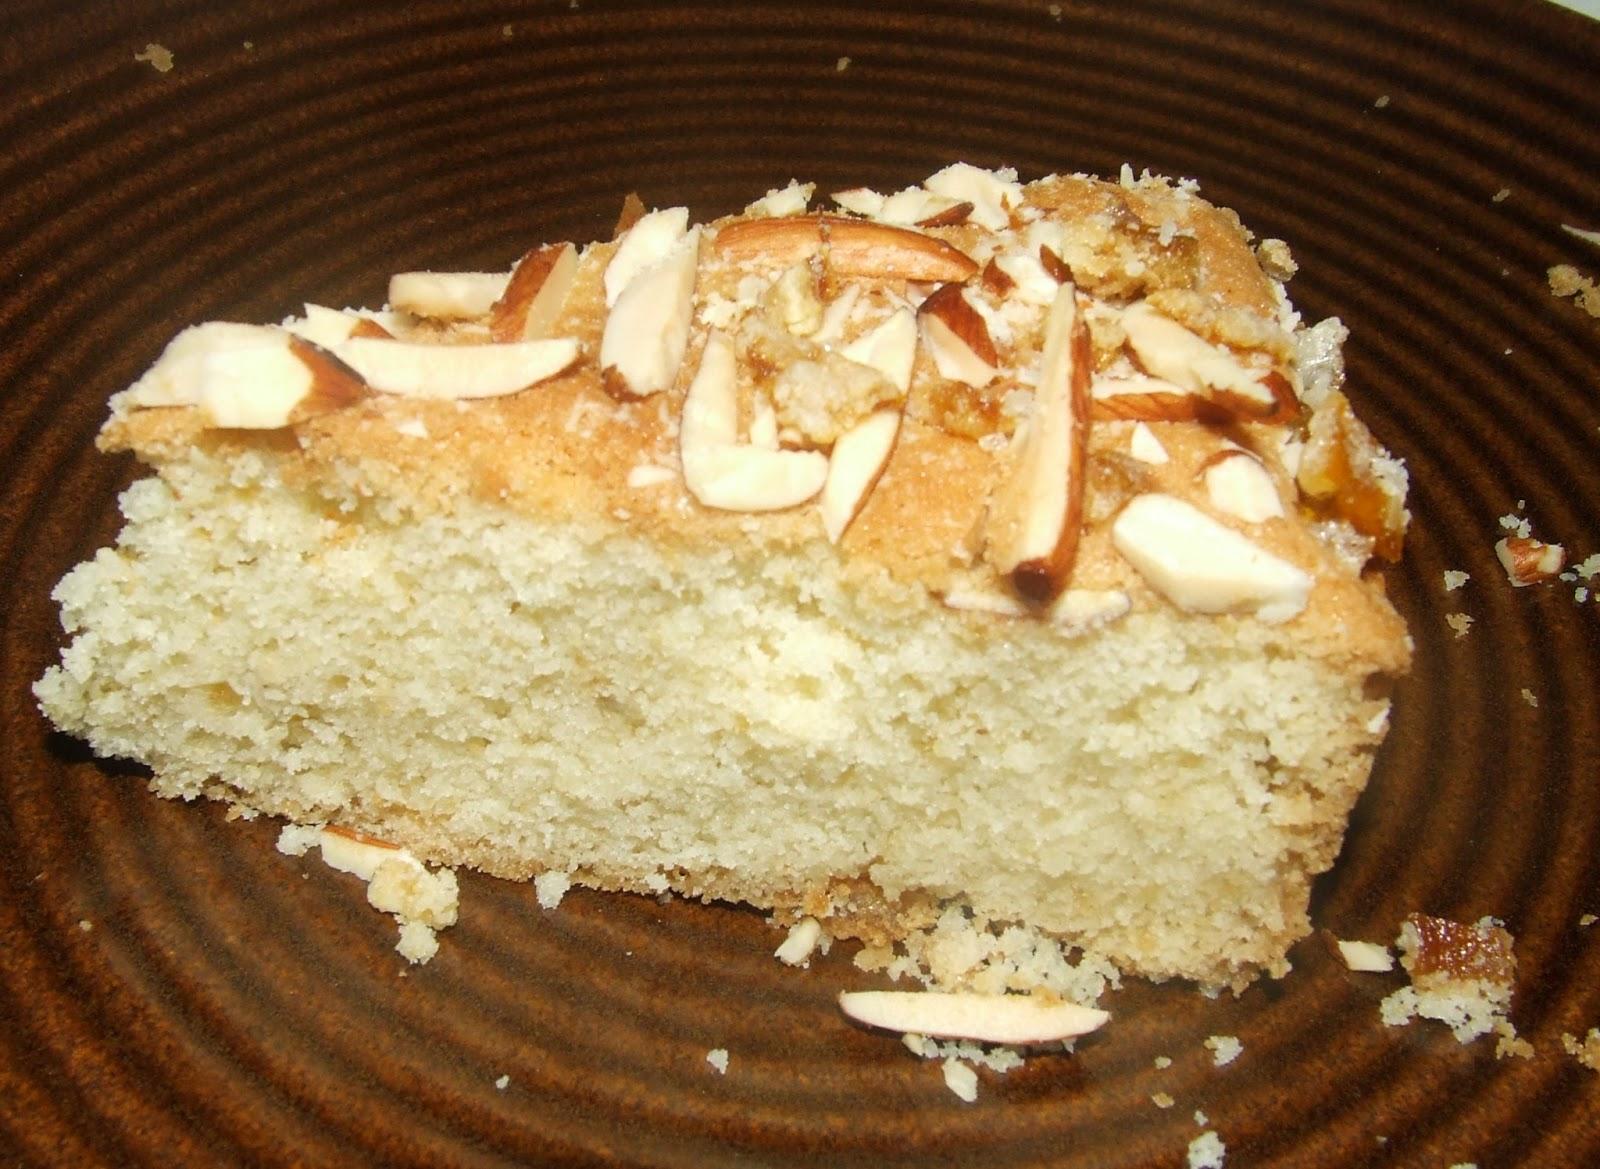 Sponge Cake Recipe Uk Plain Flour: AMBROSIA: MADEIRA CAKE